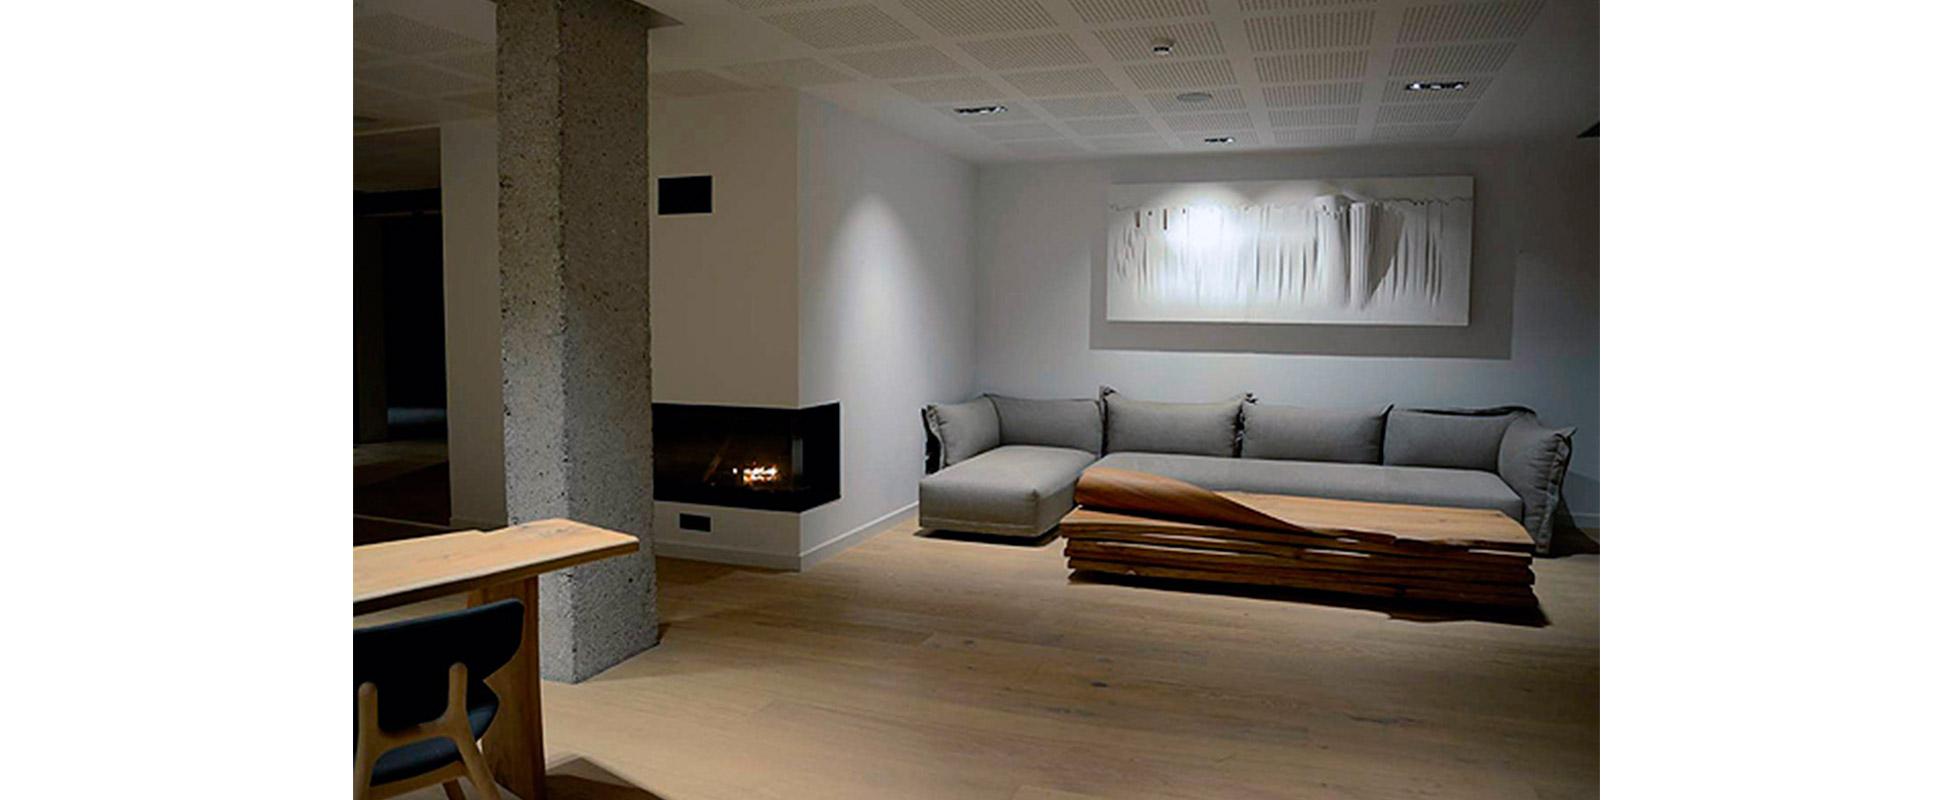 Proyectos_hotel_arantza_01